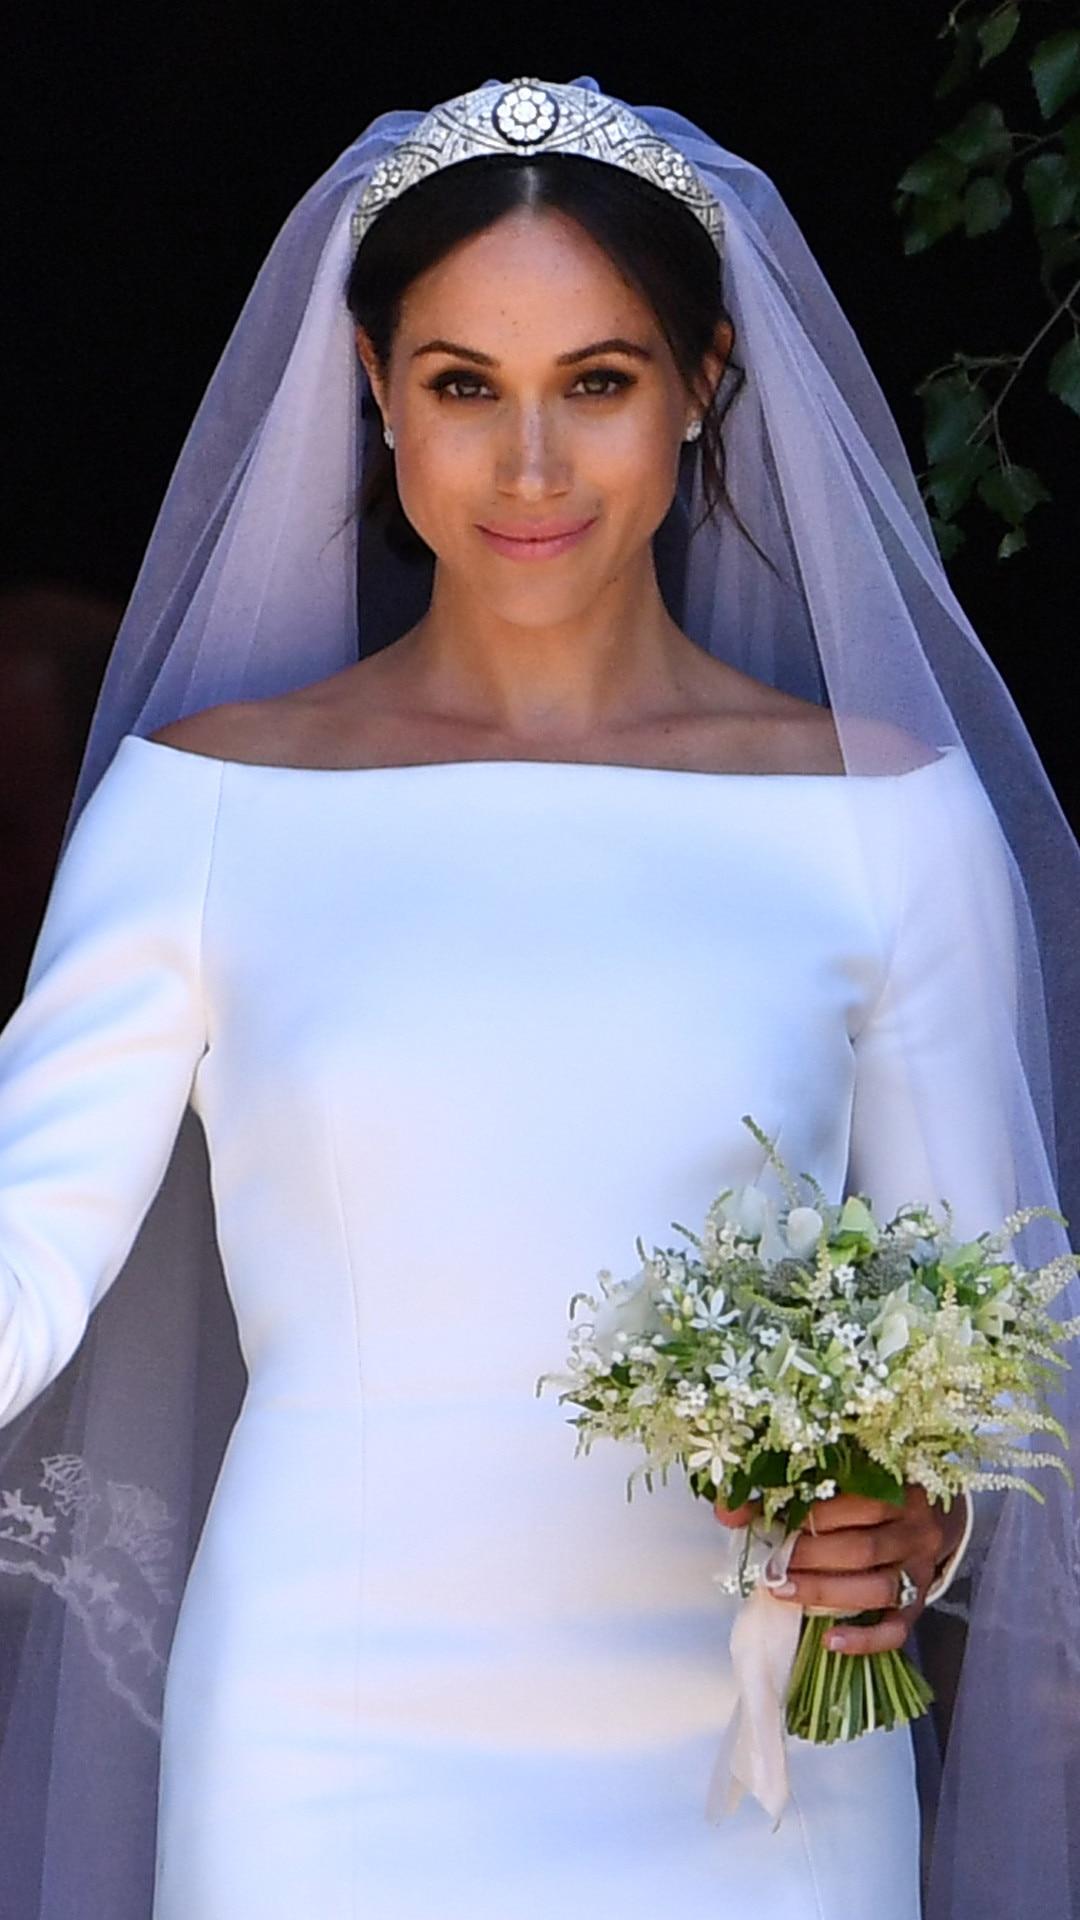 meghan markle wedding designer off 75 buy nova betel contabilidade